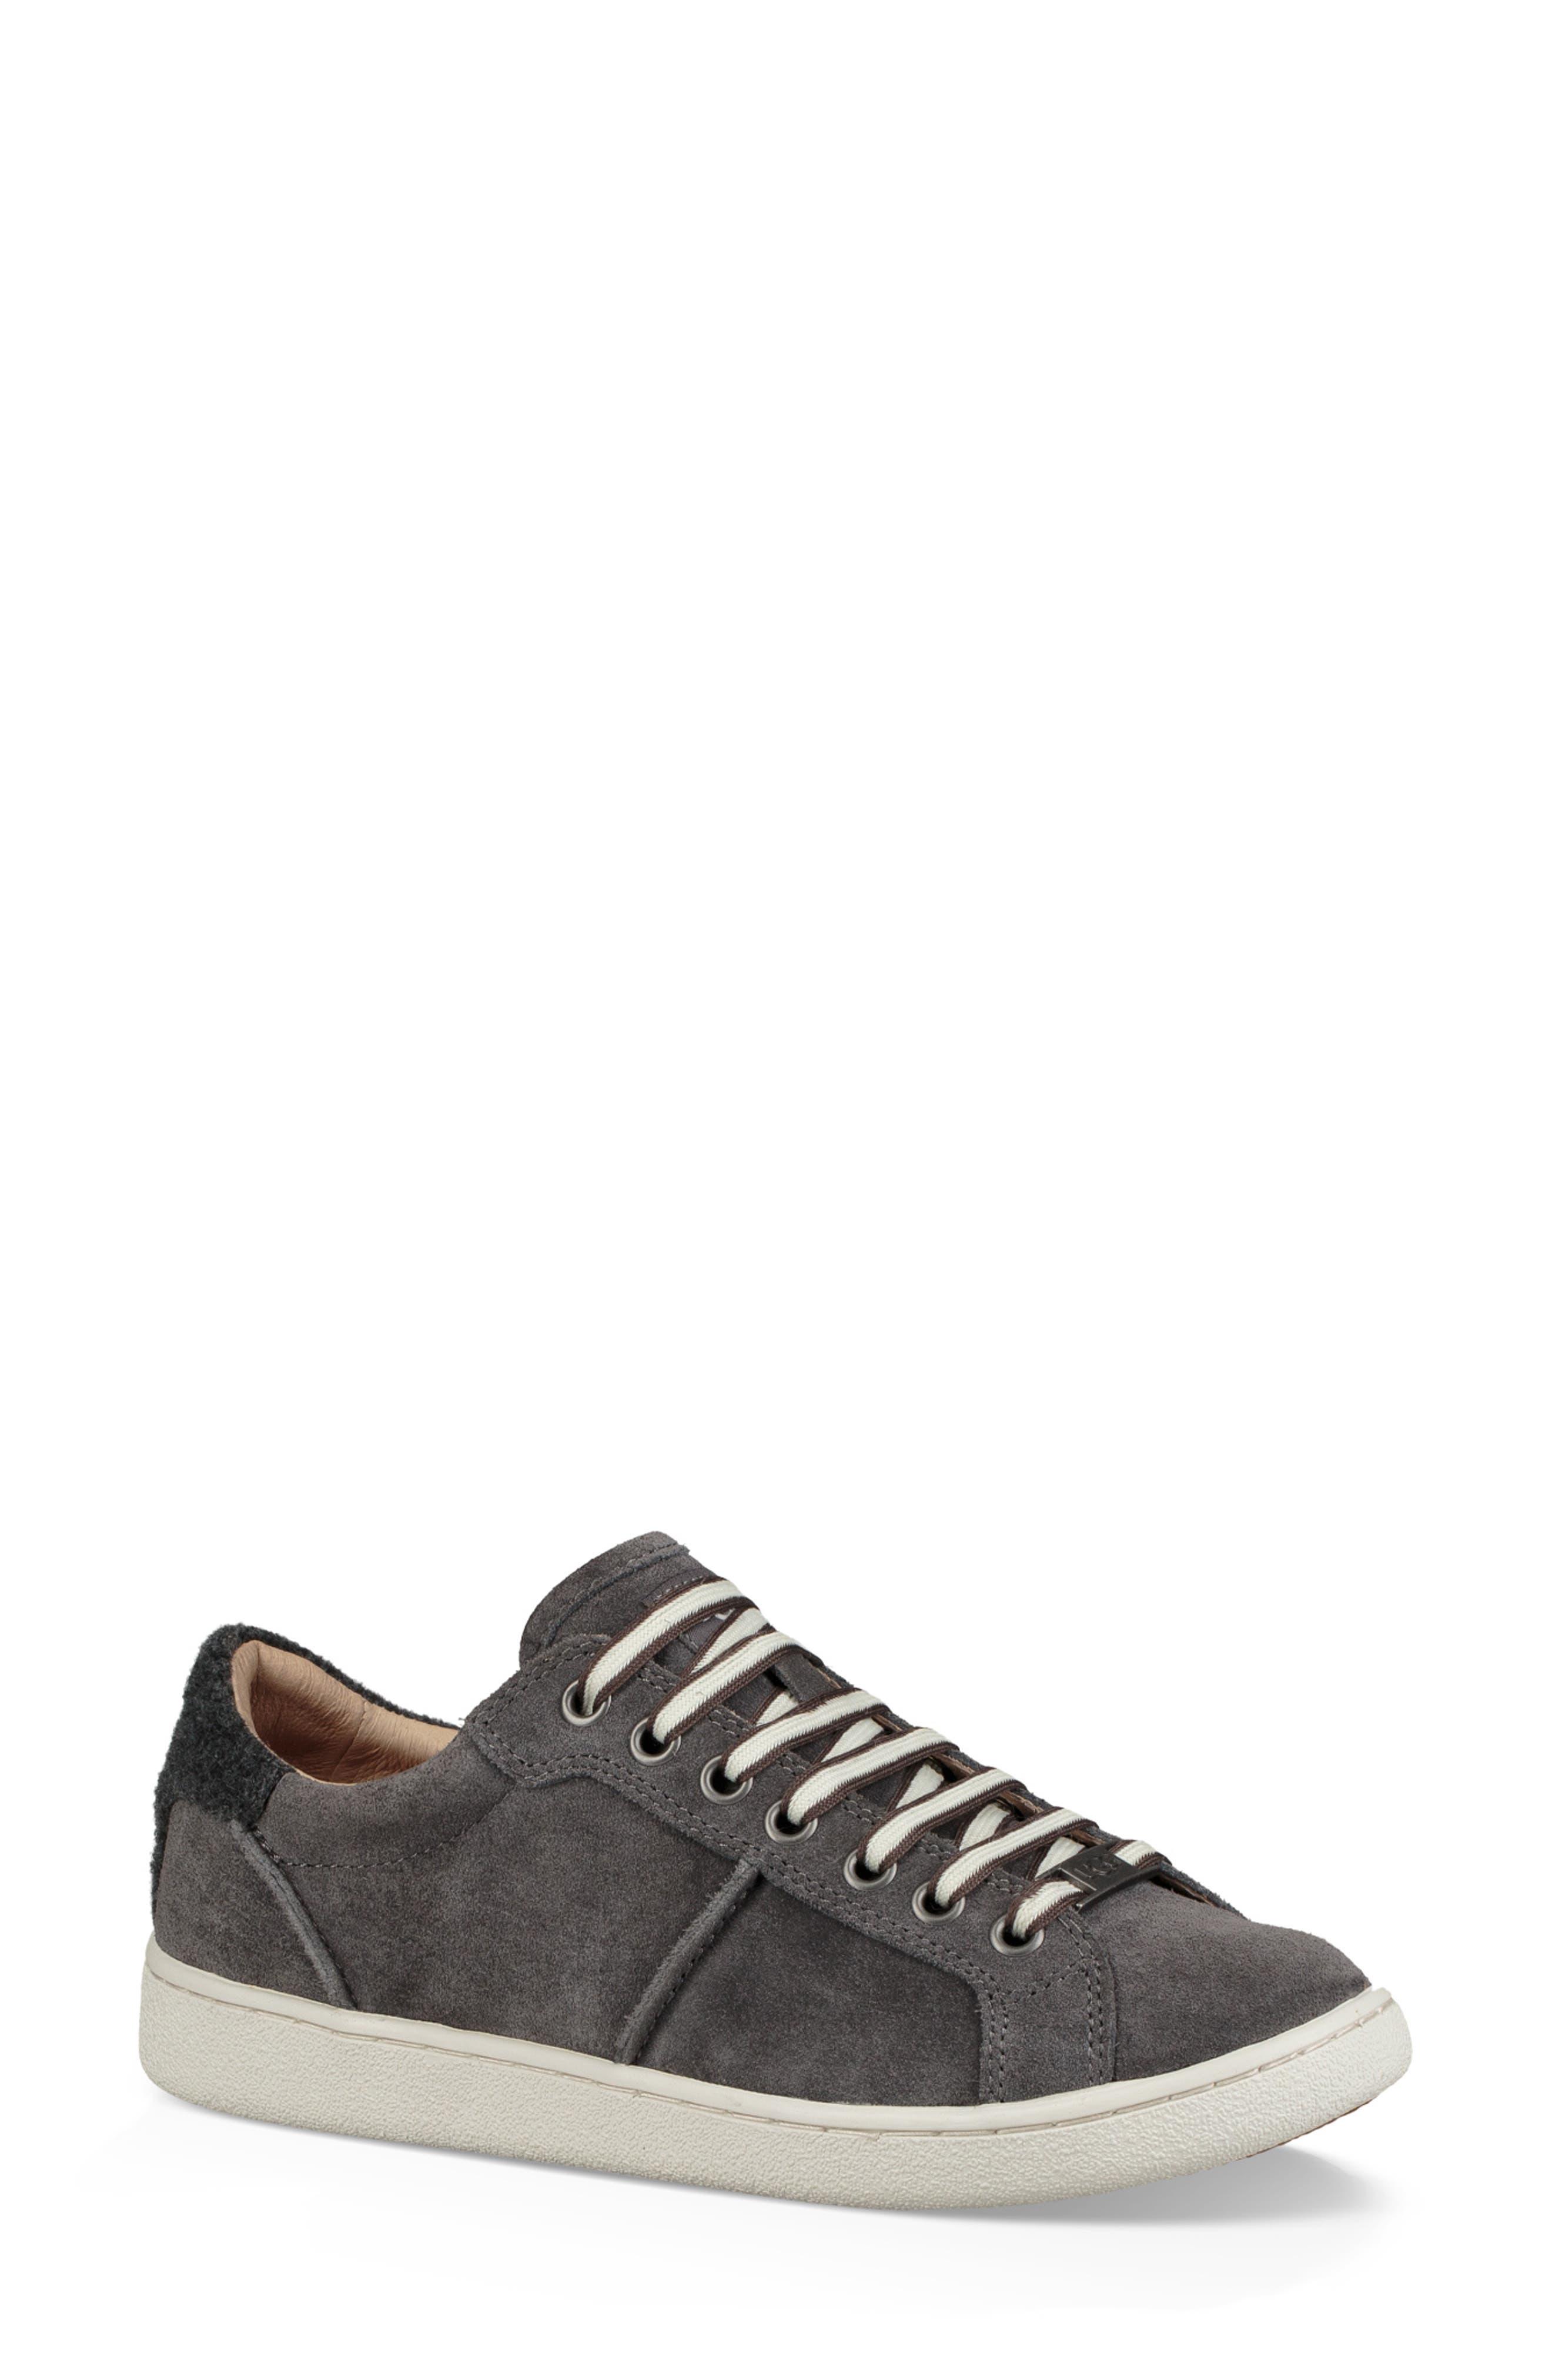 Milo Sneaker,                         Main,                         color, CHARCOAL SUEDE